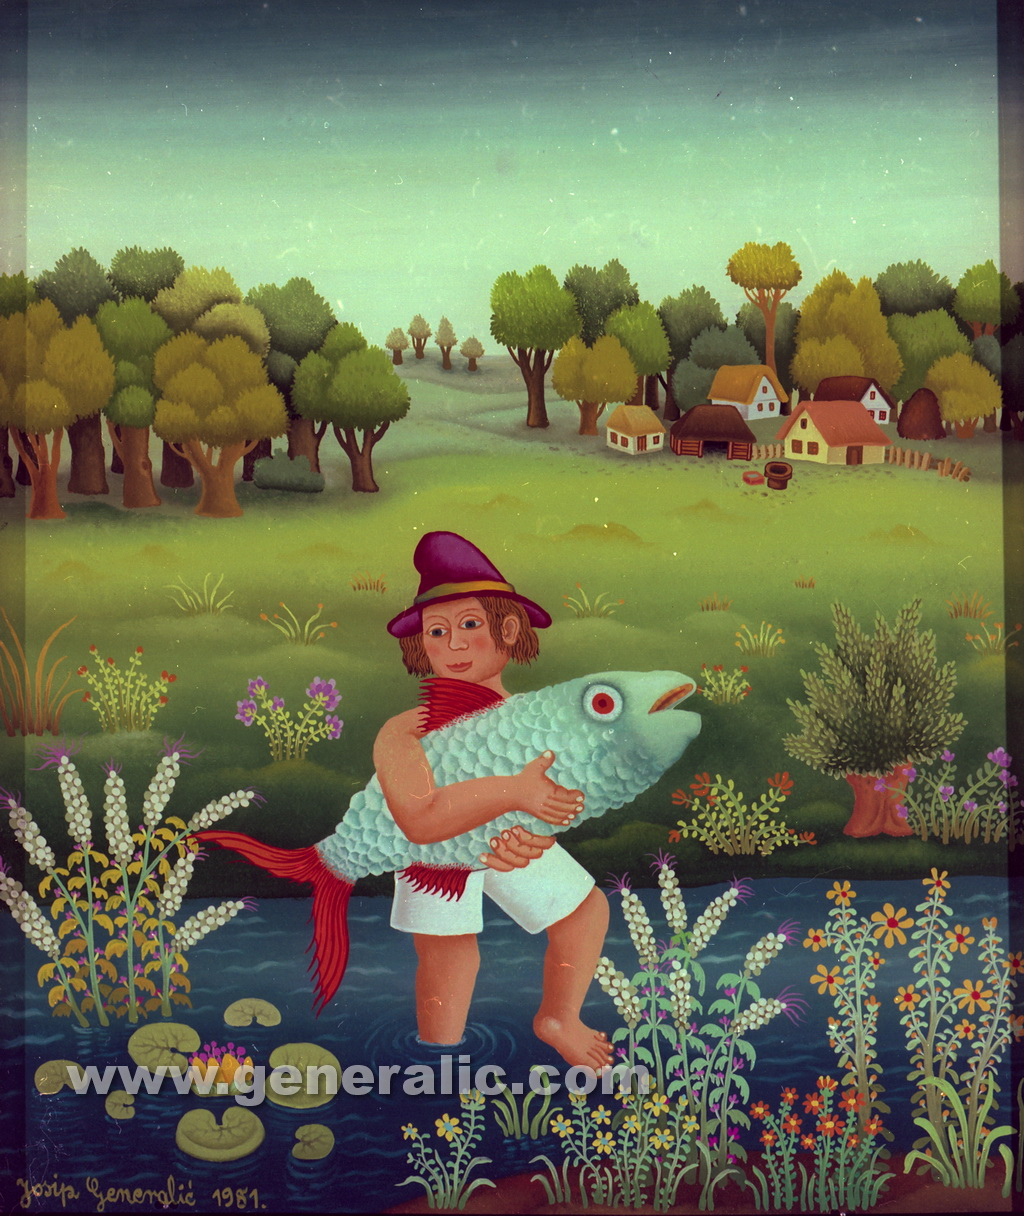 Josip Generalic, 1981, Fisherman with blue fish, oil on glass